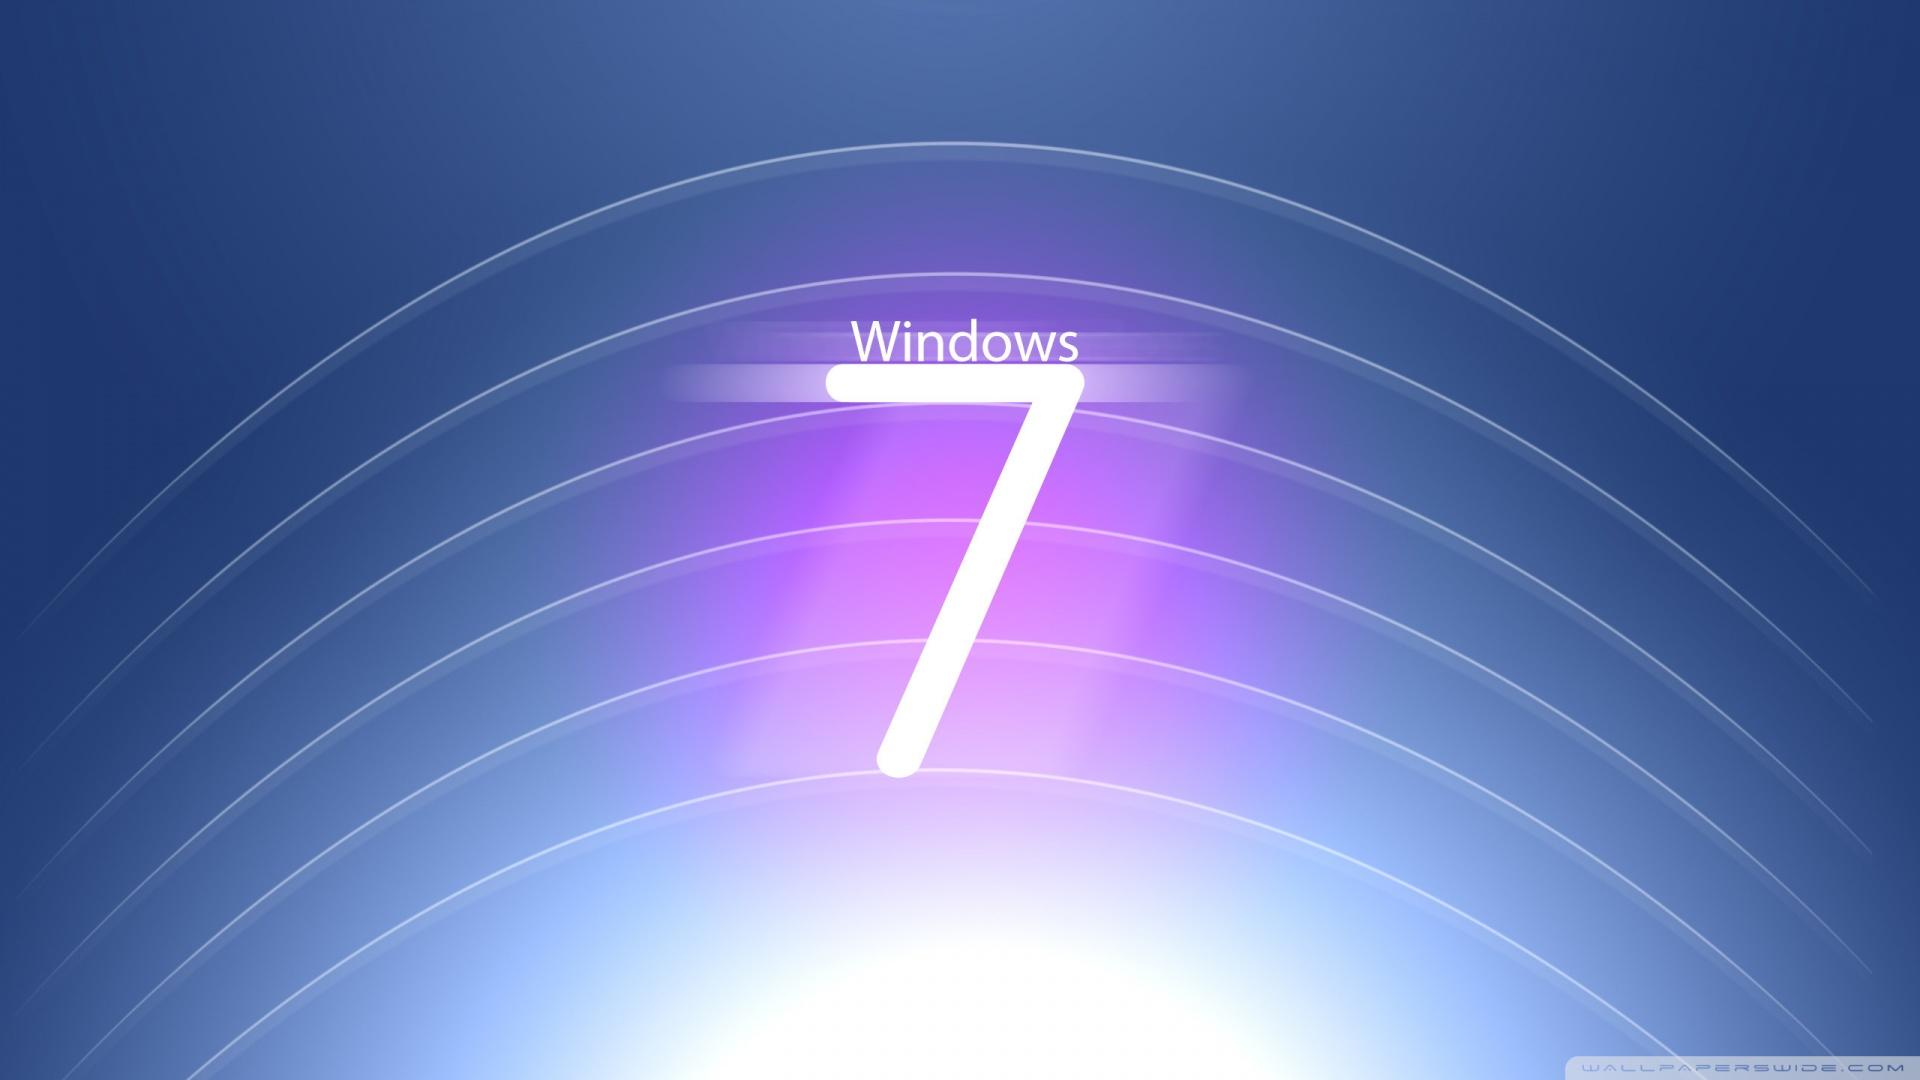 Hi Tech Windows 7 Logo Wallpaper 1920x1080 Hi Tech Windows 7 Logo 1920x1080